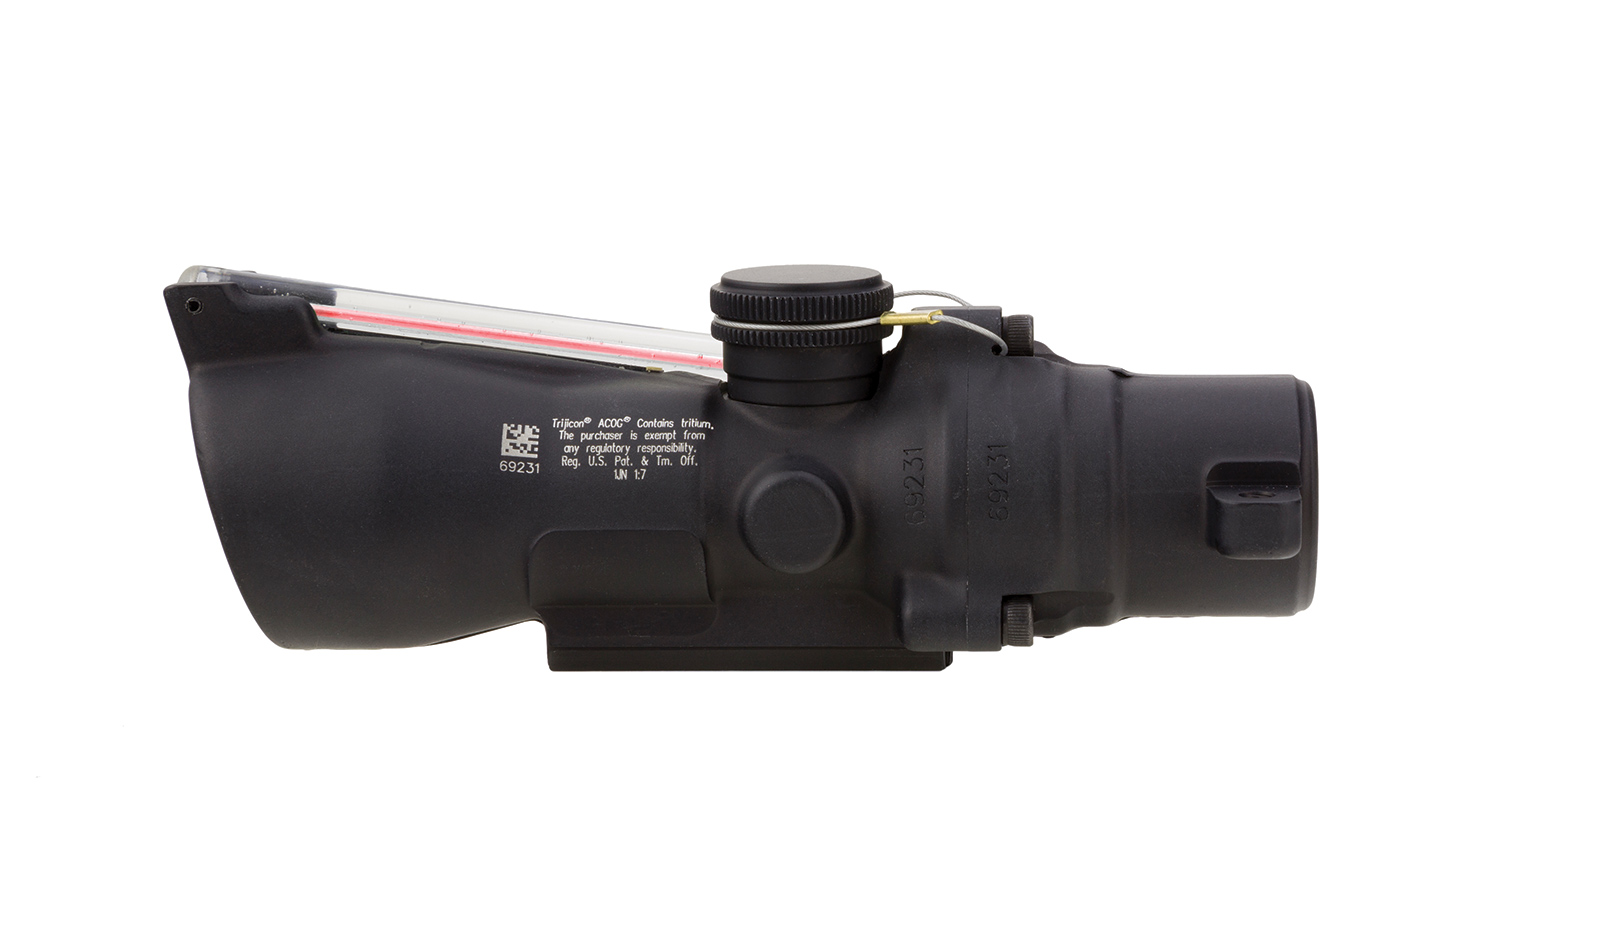 TA50-C-400229 angle 2